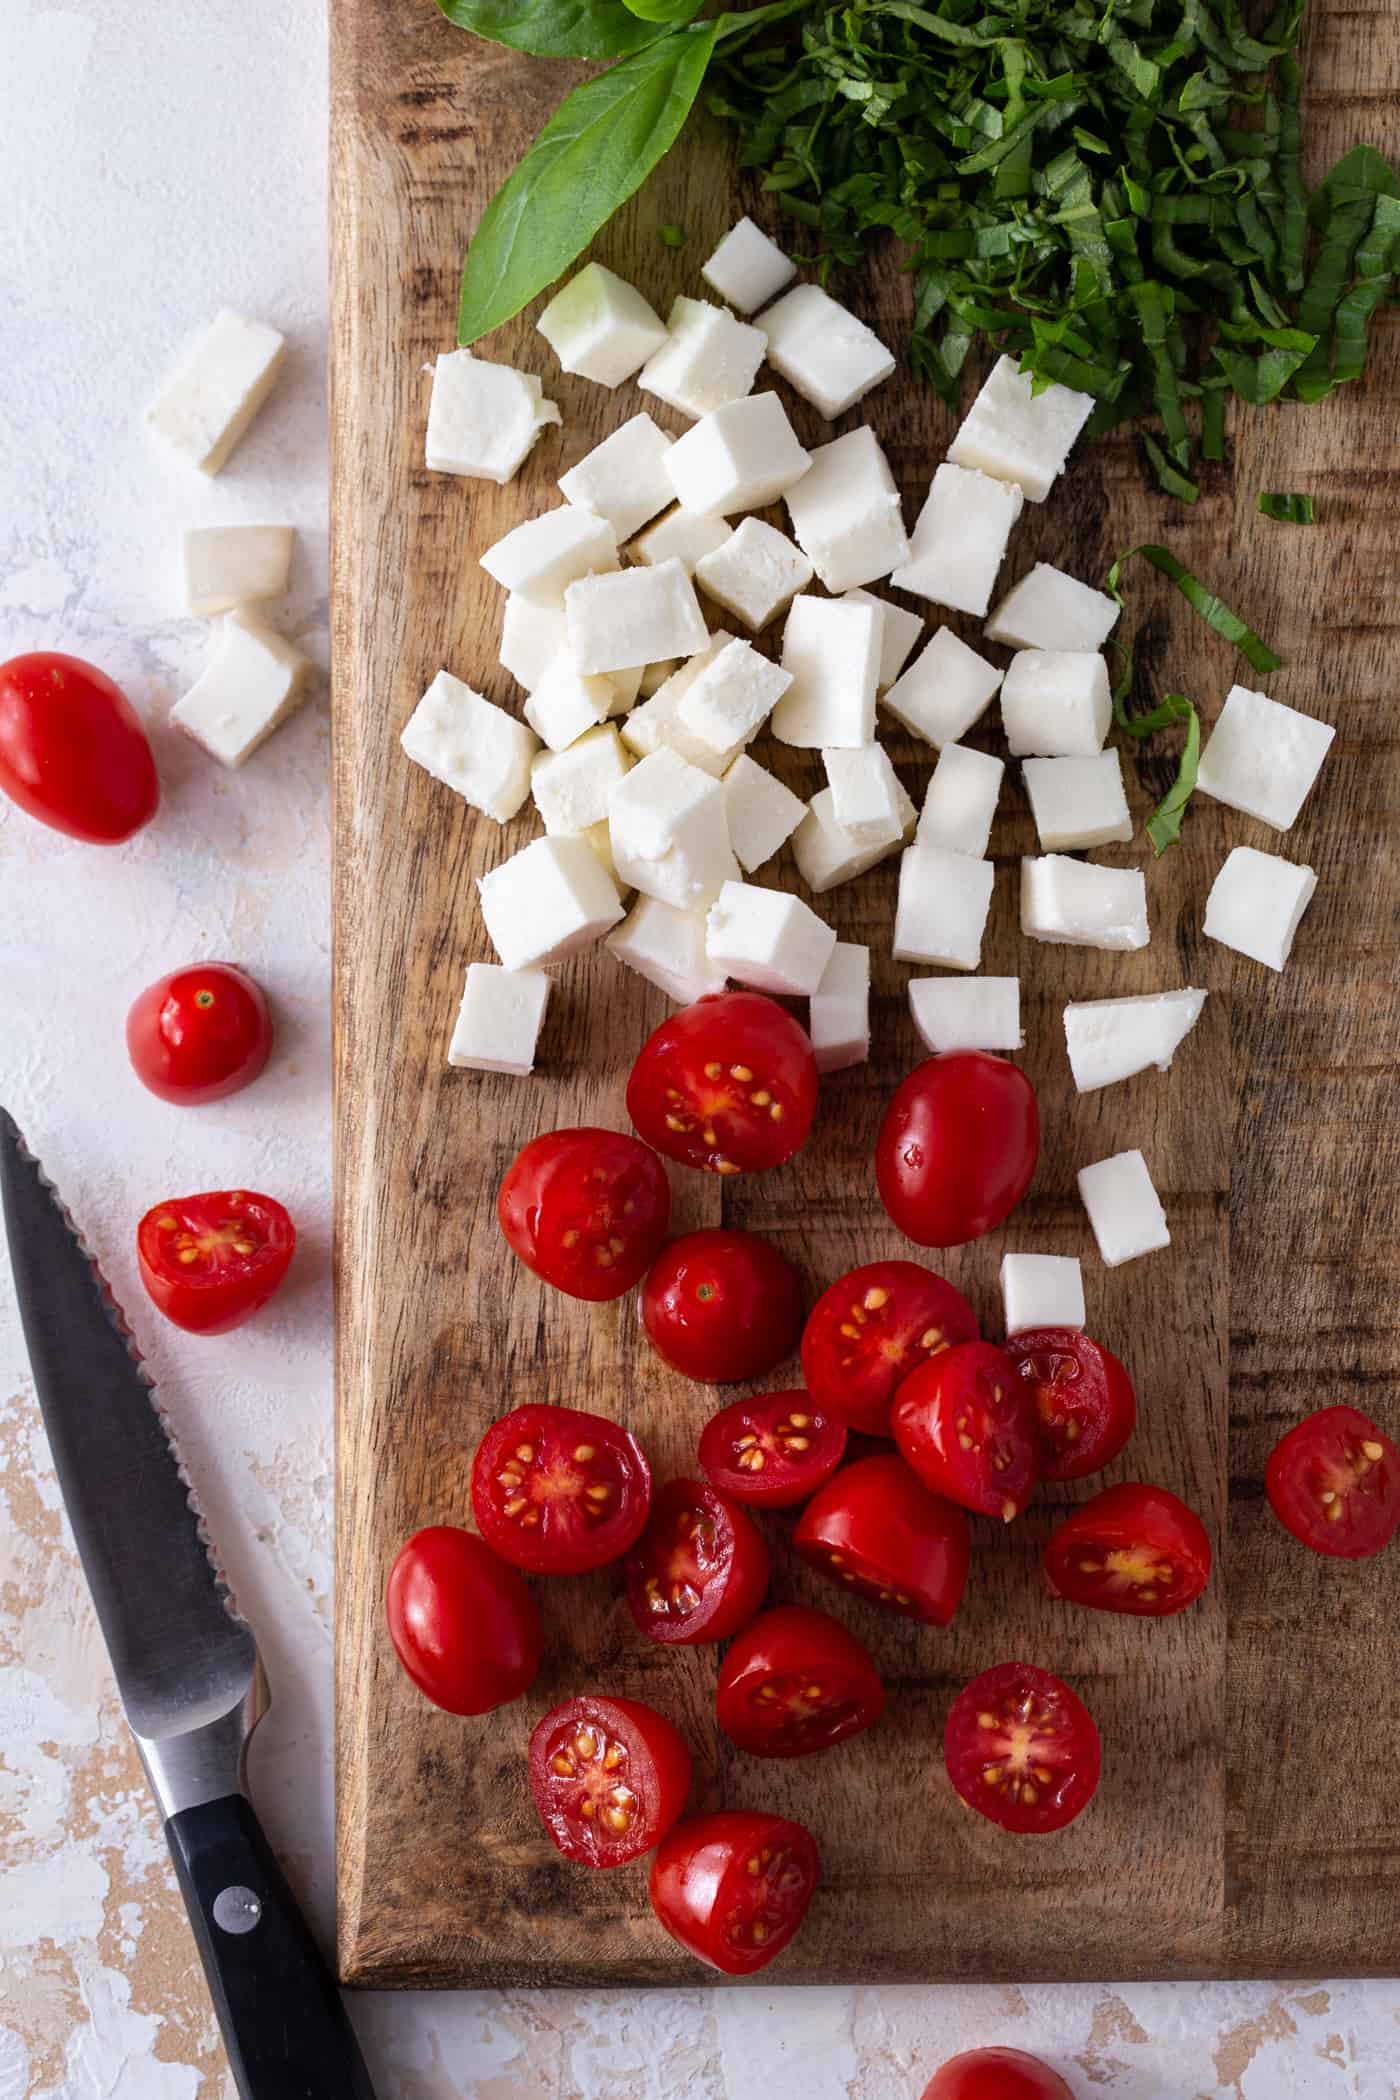 Fresh mozzarella, cherry tomatoes and fresh basil on cutting board.